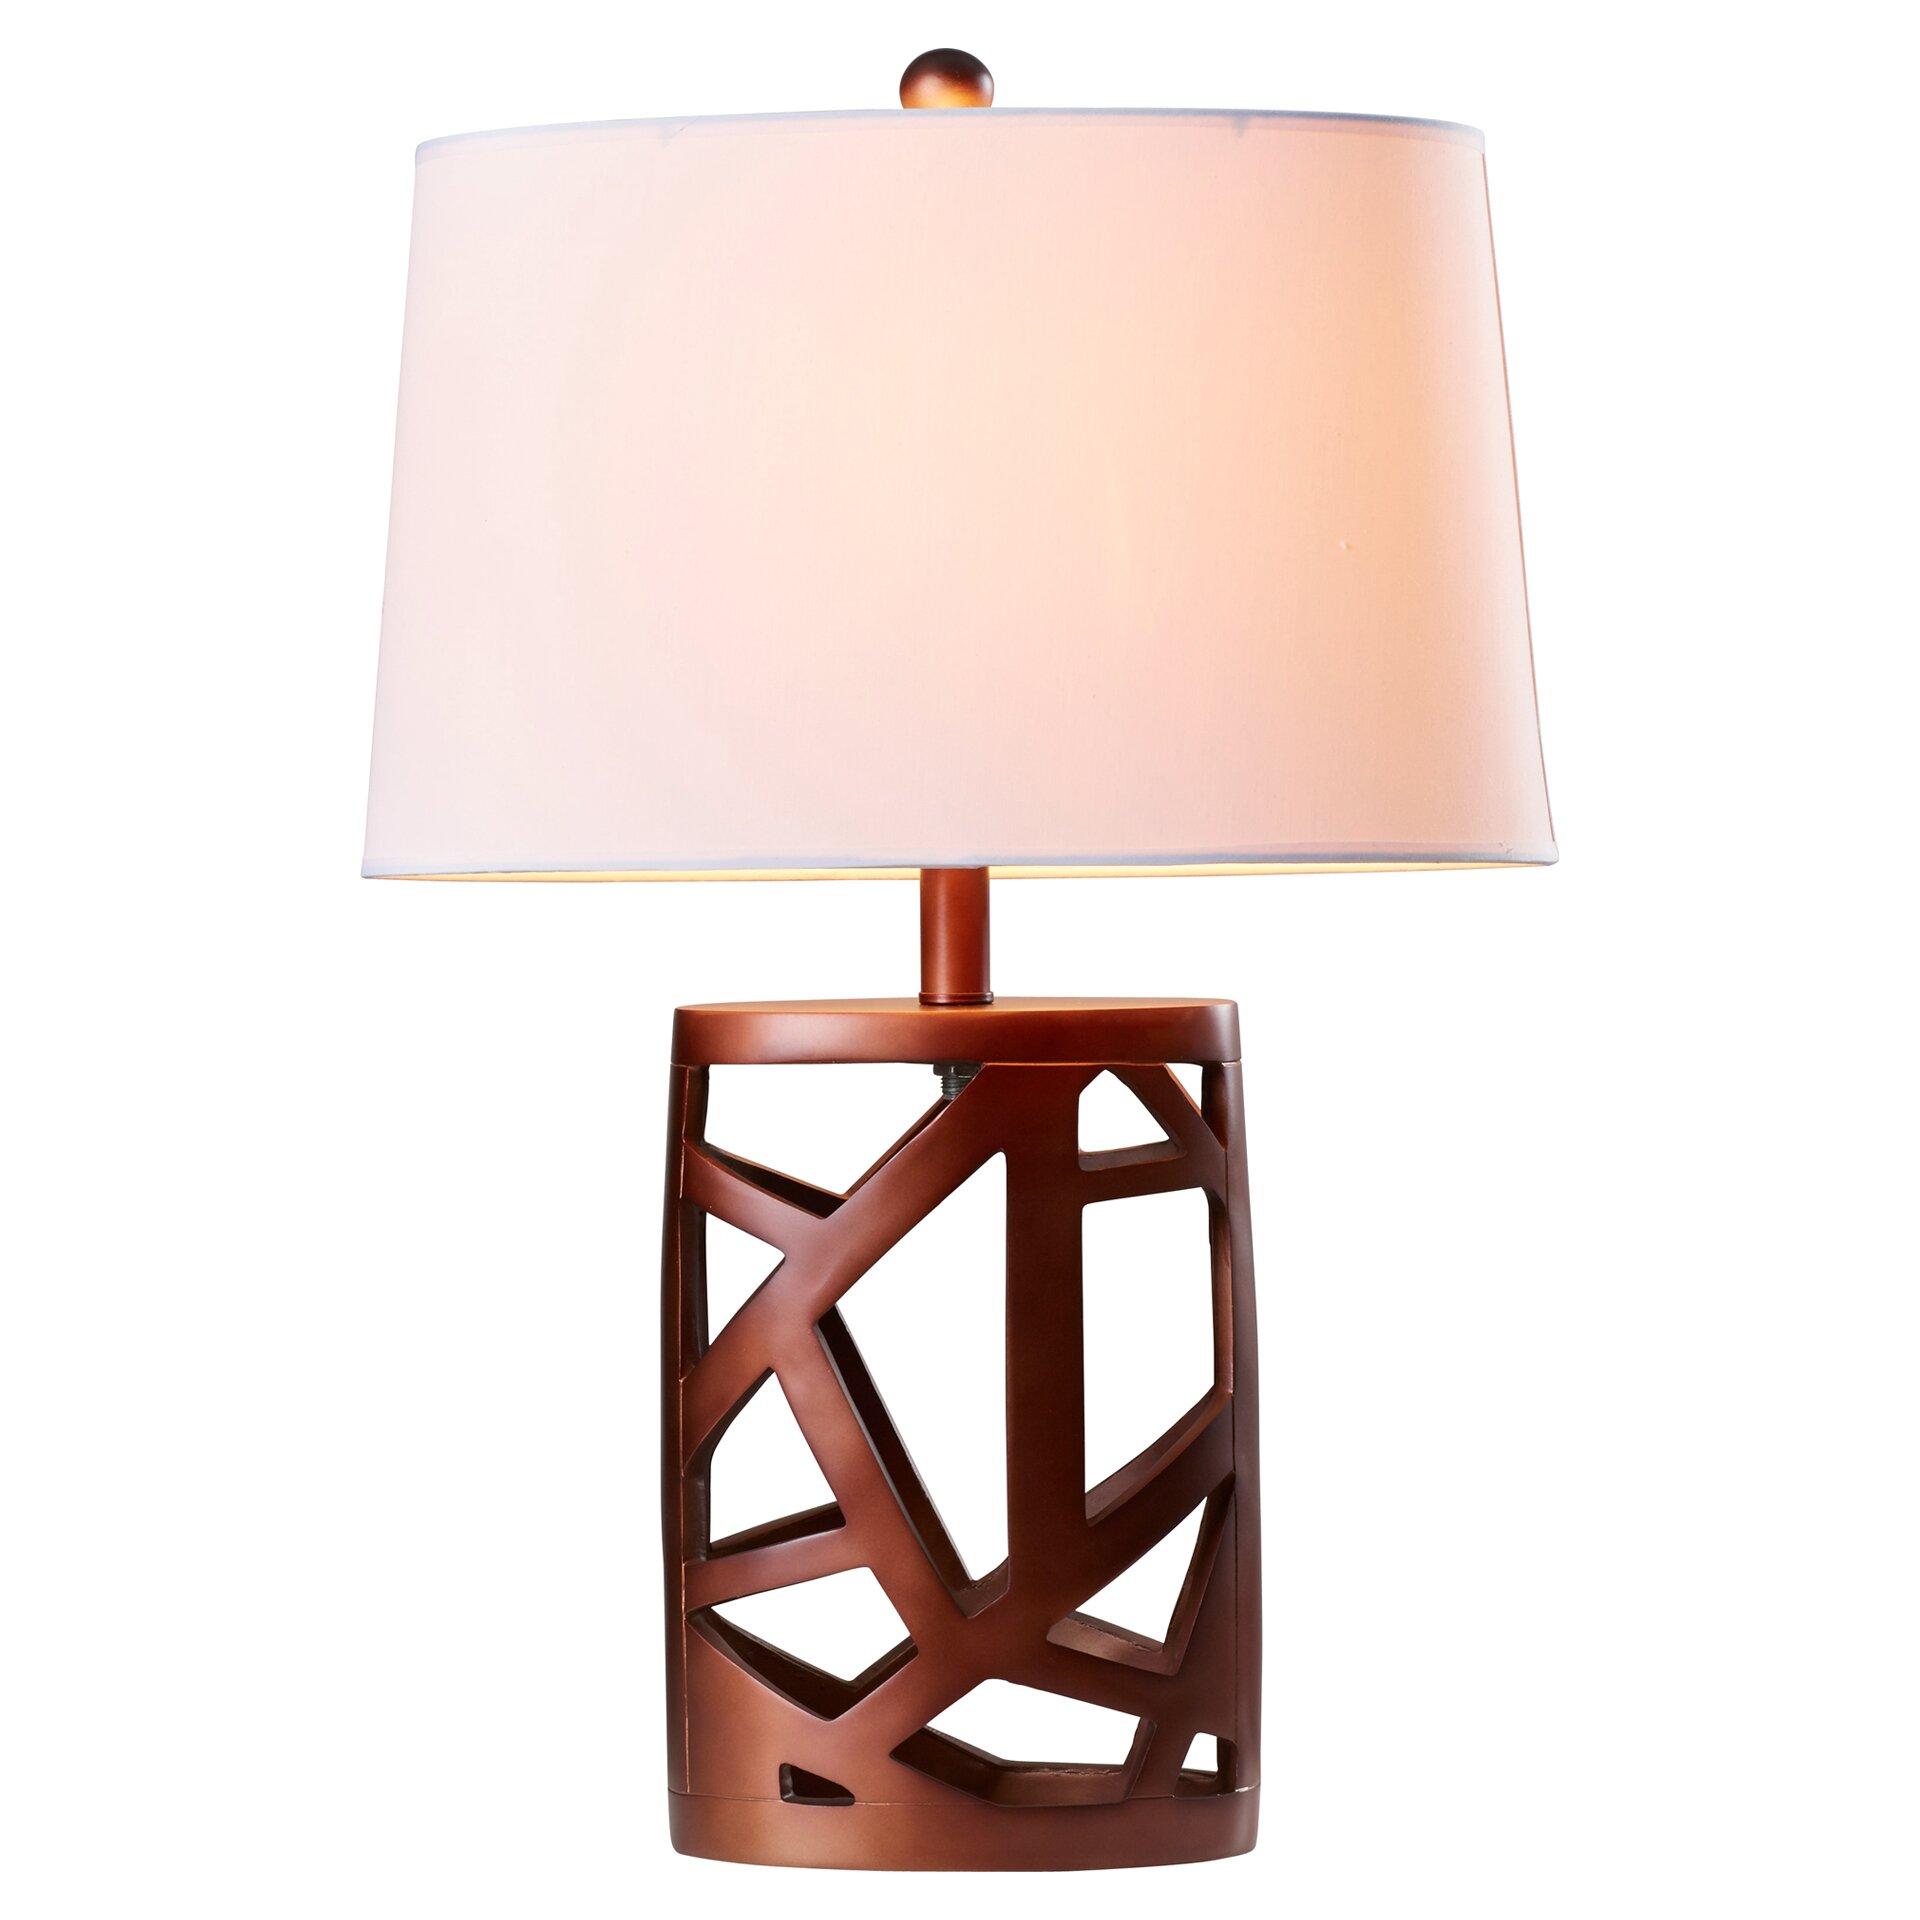 Trent austin design kaulton 25 5 table lamp reviews for Lamp shades austin